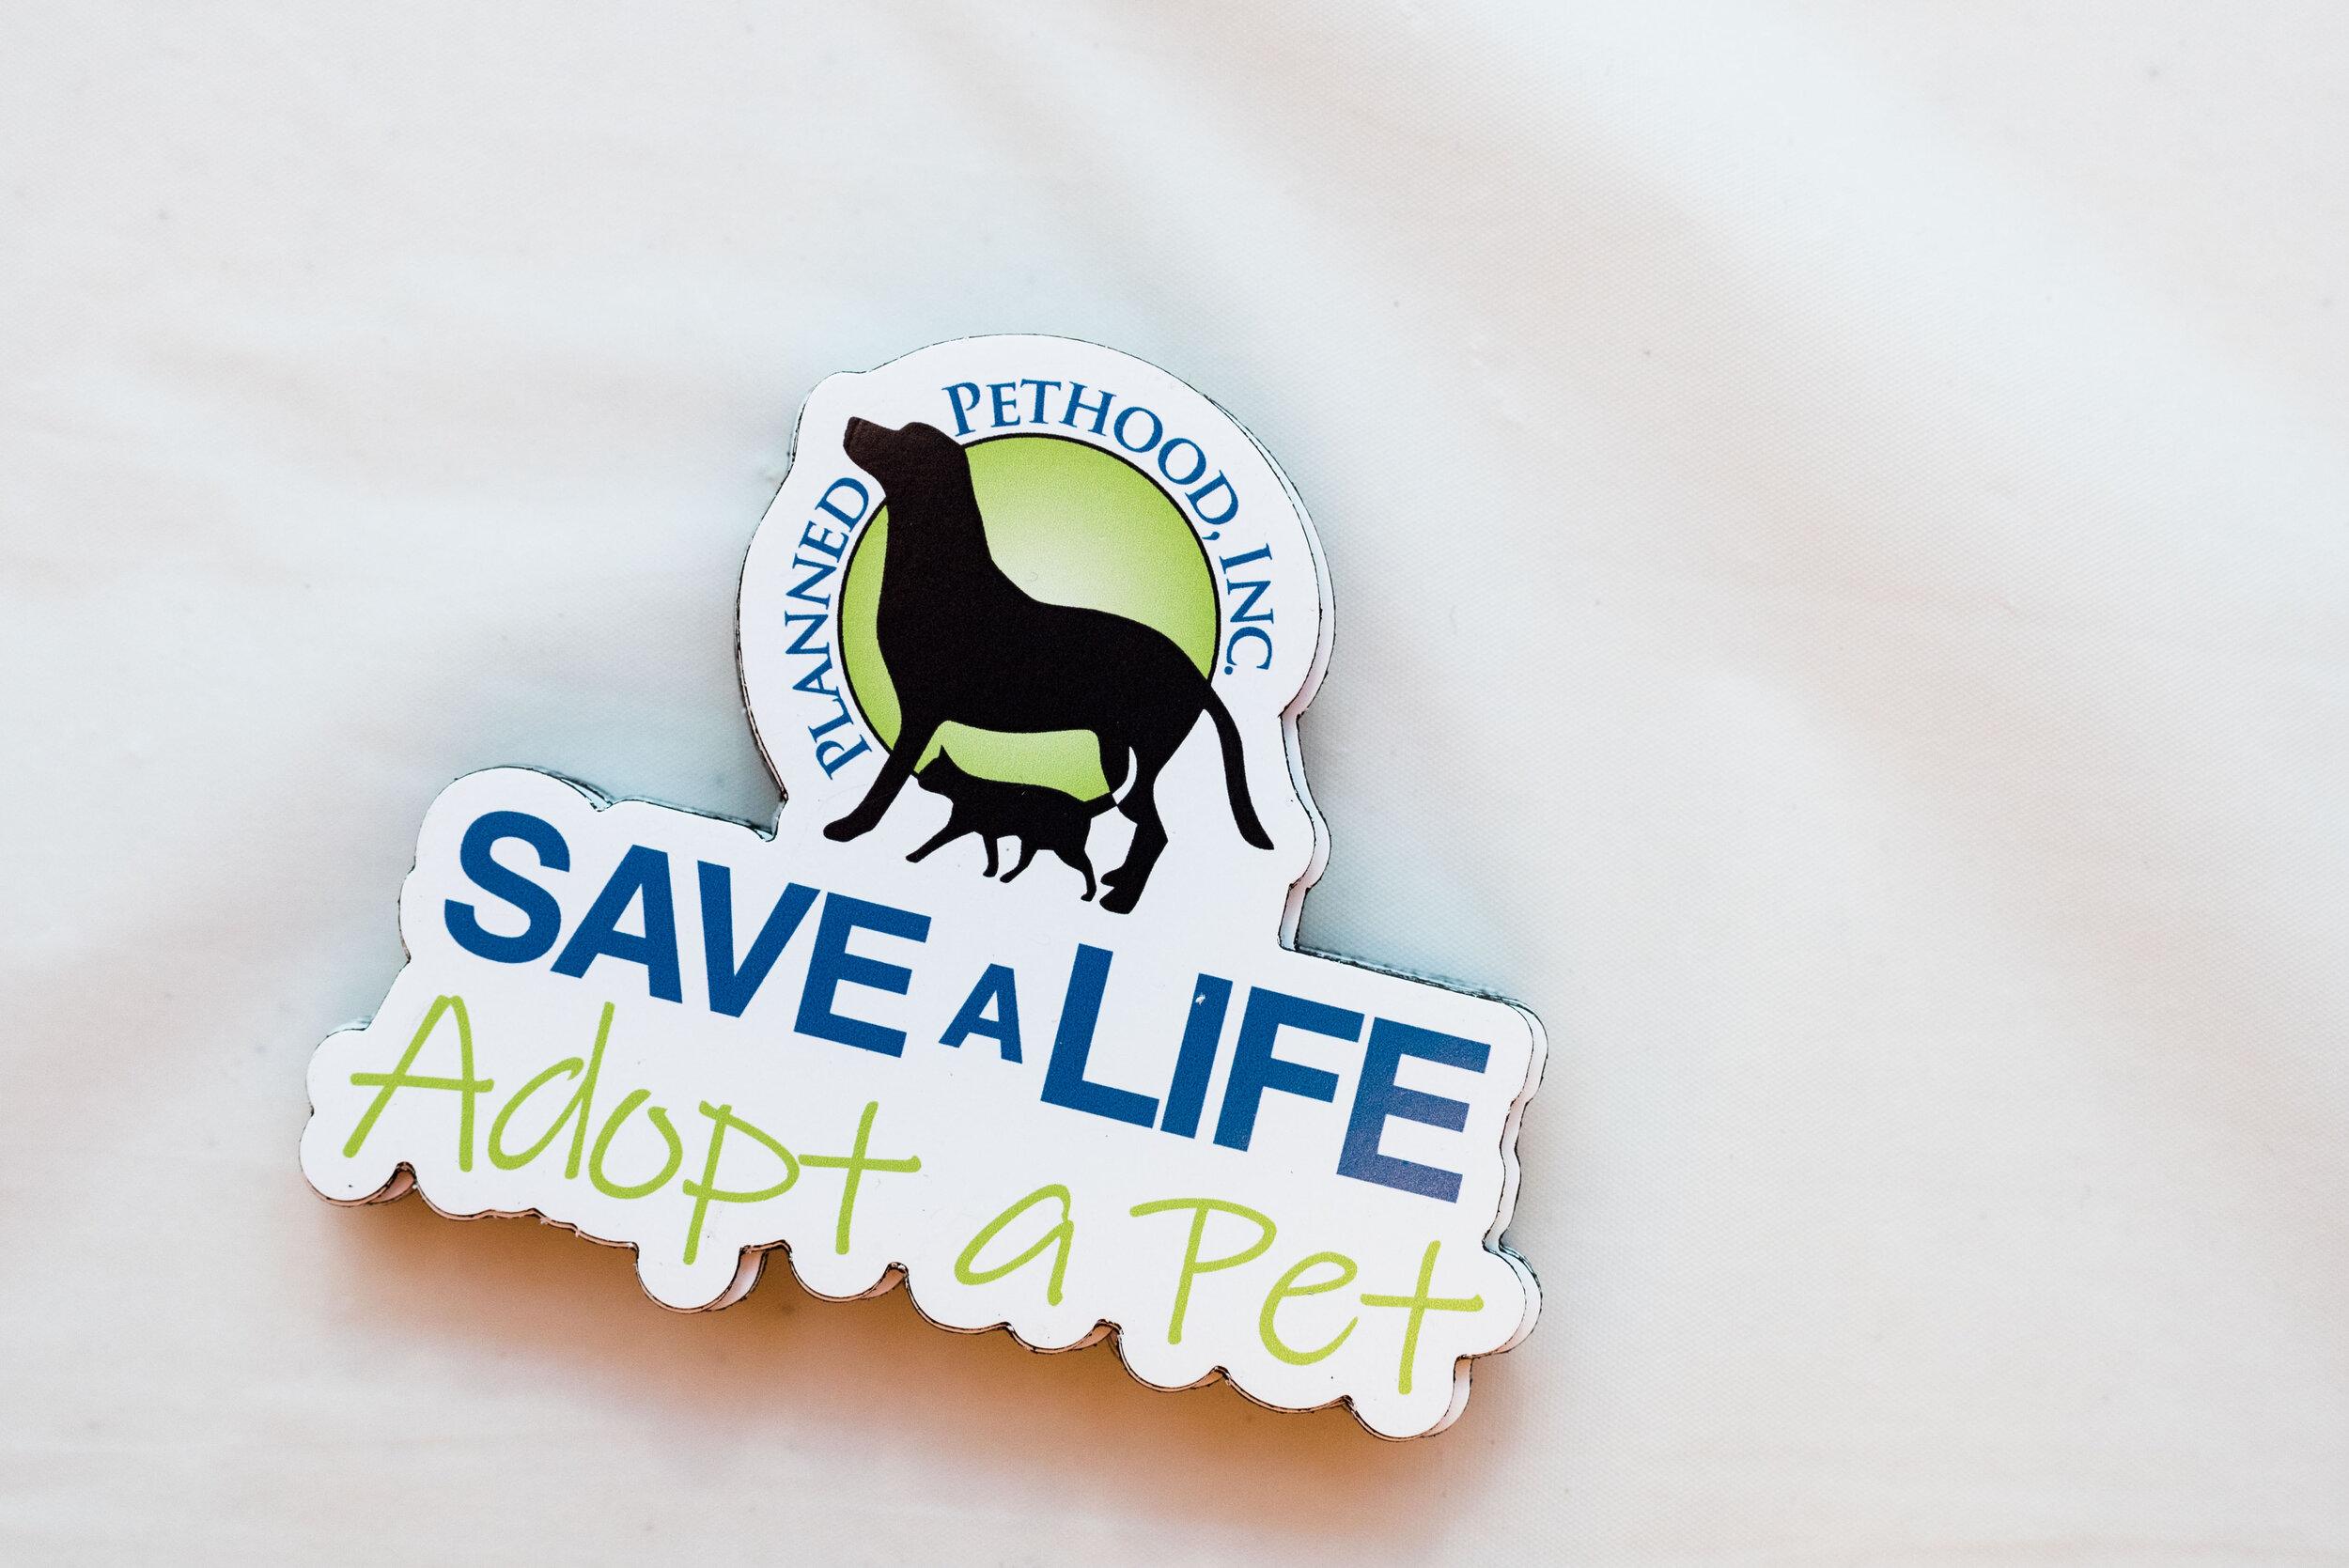 toledo area pet photography pet adoption-9.jpg